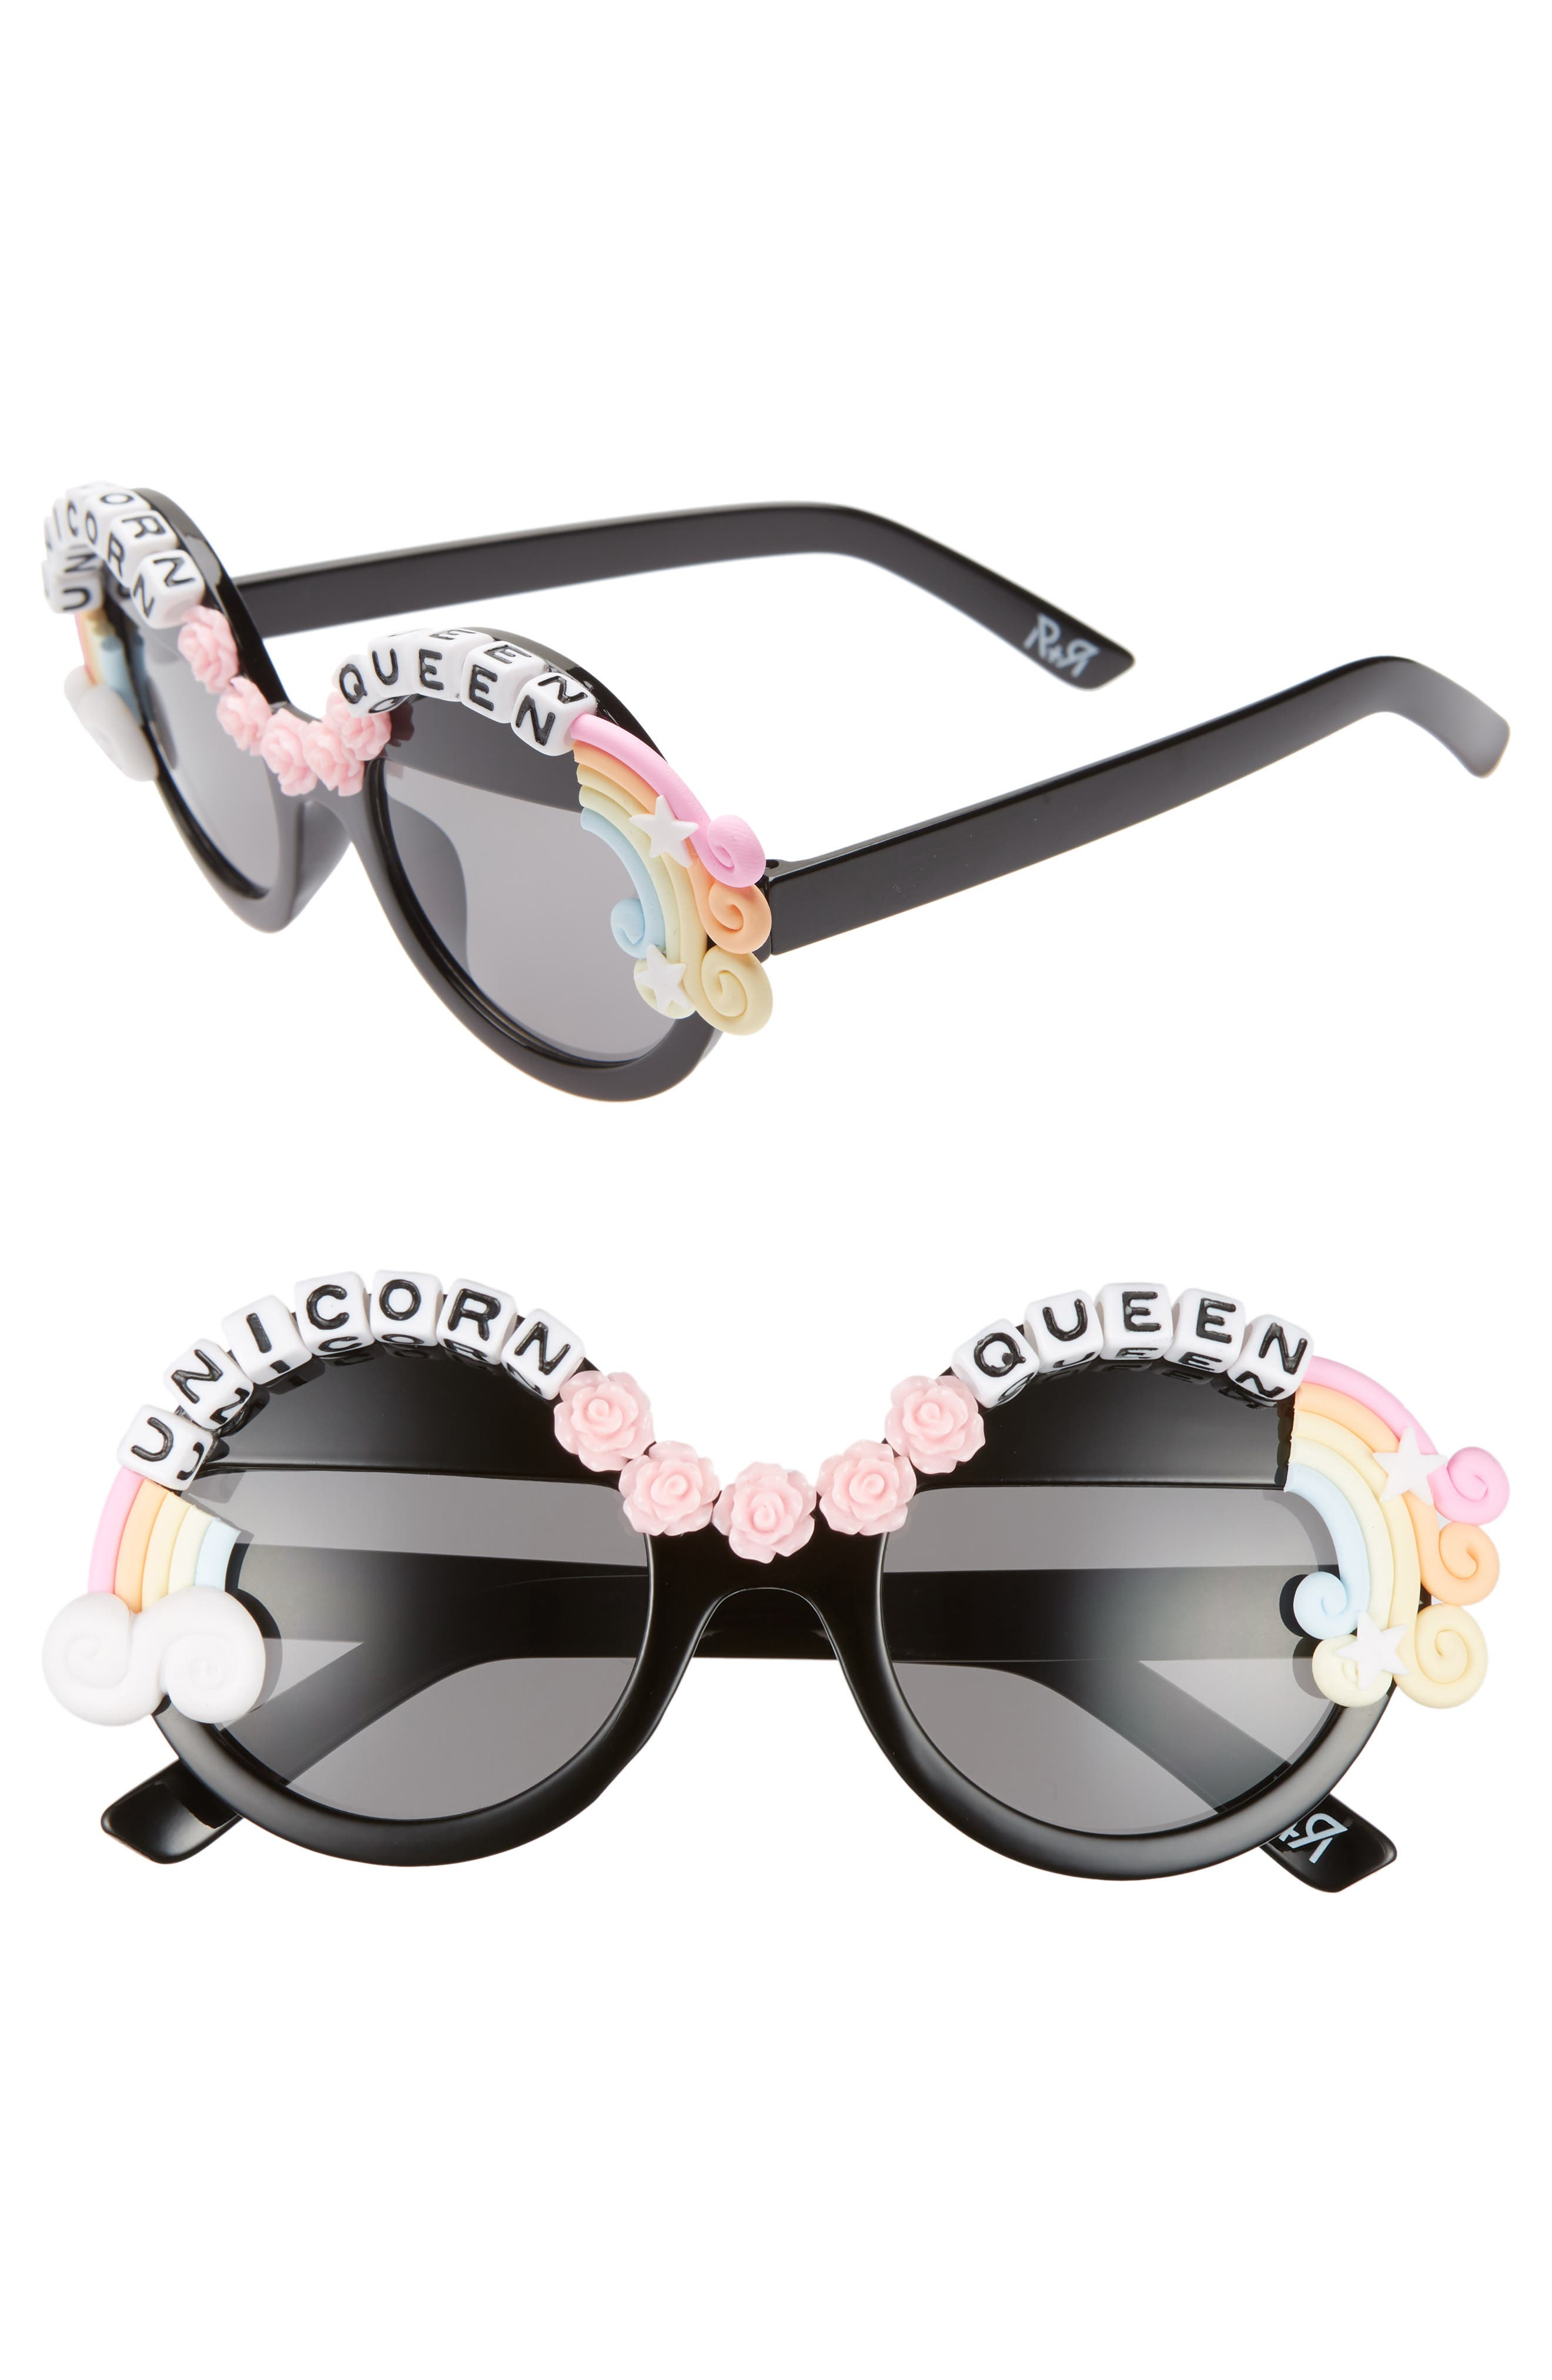 Rad + Refined Unicorn Queen Round Sunglasses - Black/ Pink